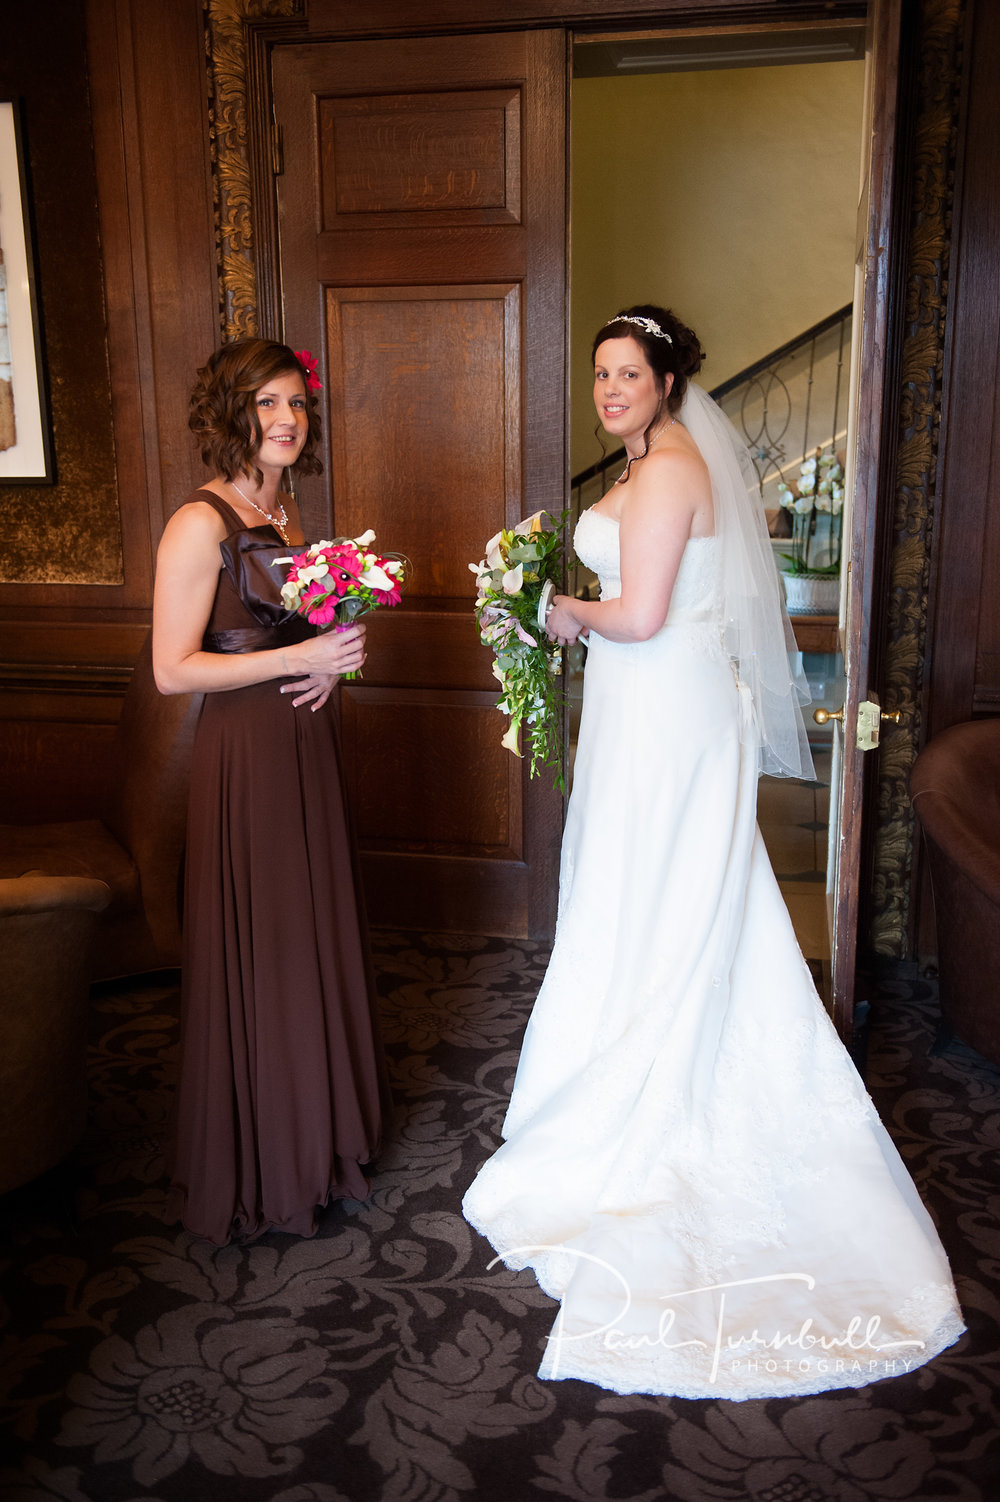 wedding-photography-wood-hall-wetherby-yorkshire-028.jpg